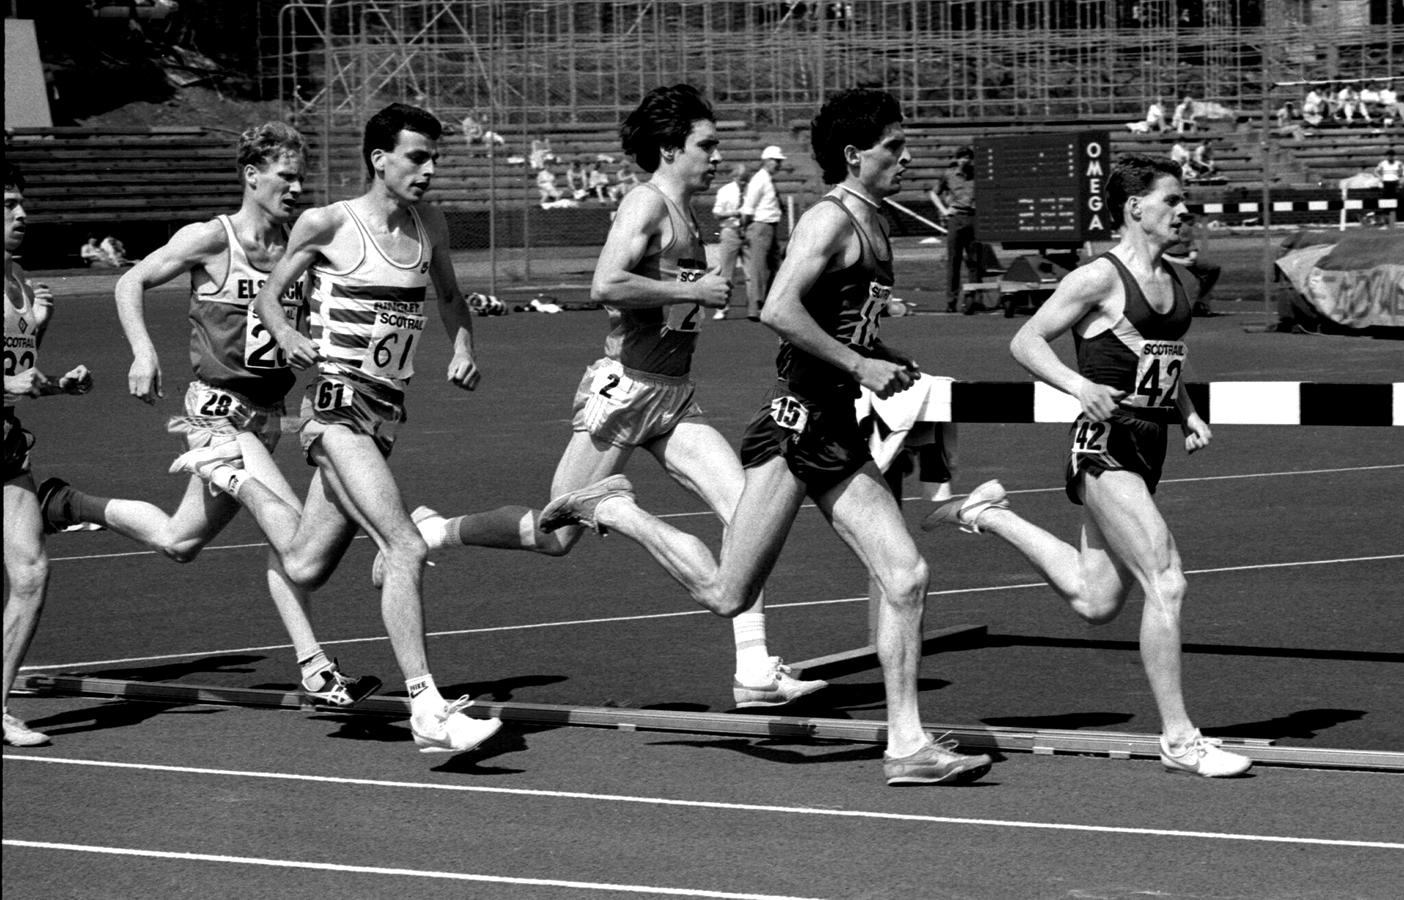 Adrian Callan (15) - Winner, SAAA 1500m, 1986